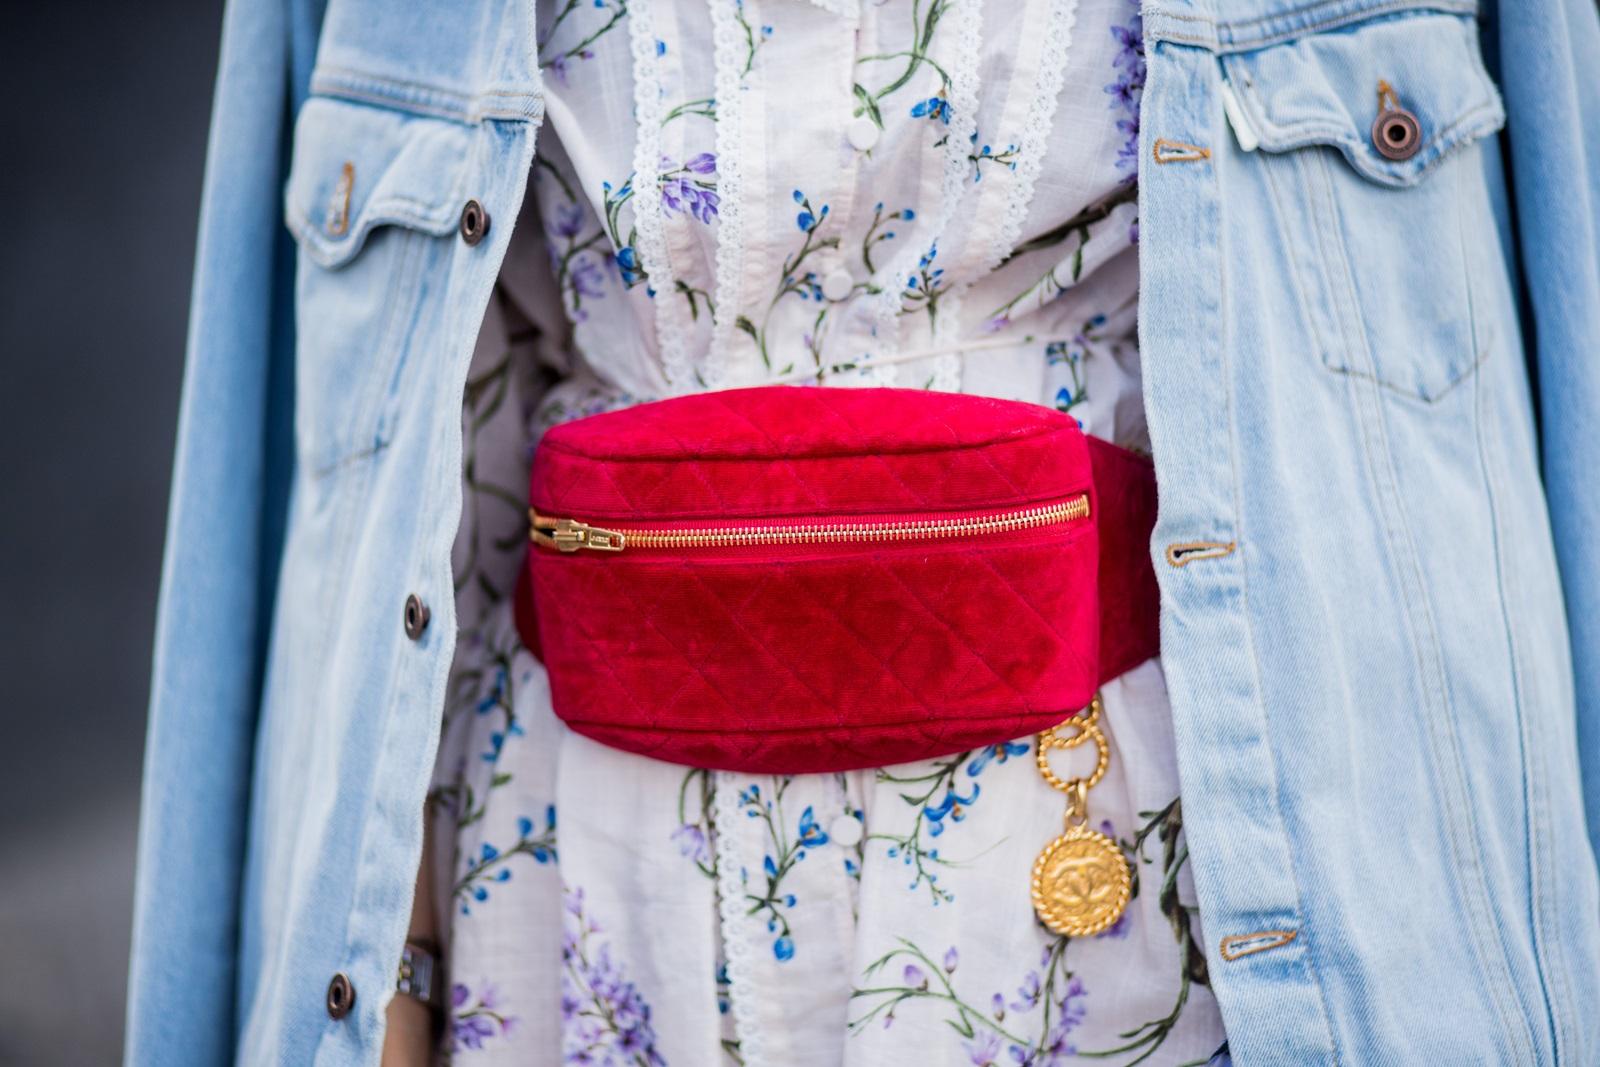 Vintage Chanel Belt Bag Luxussachen.com